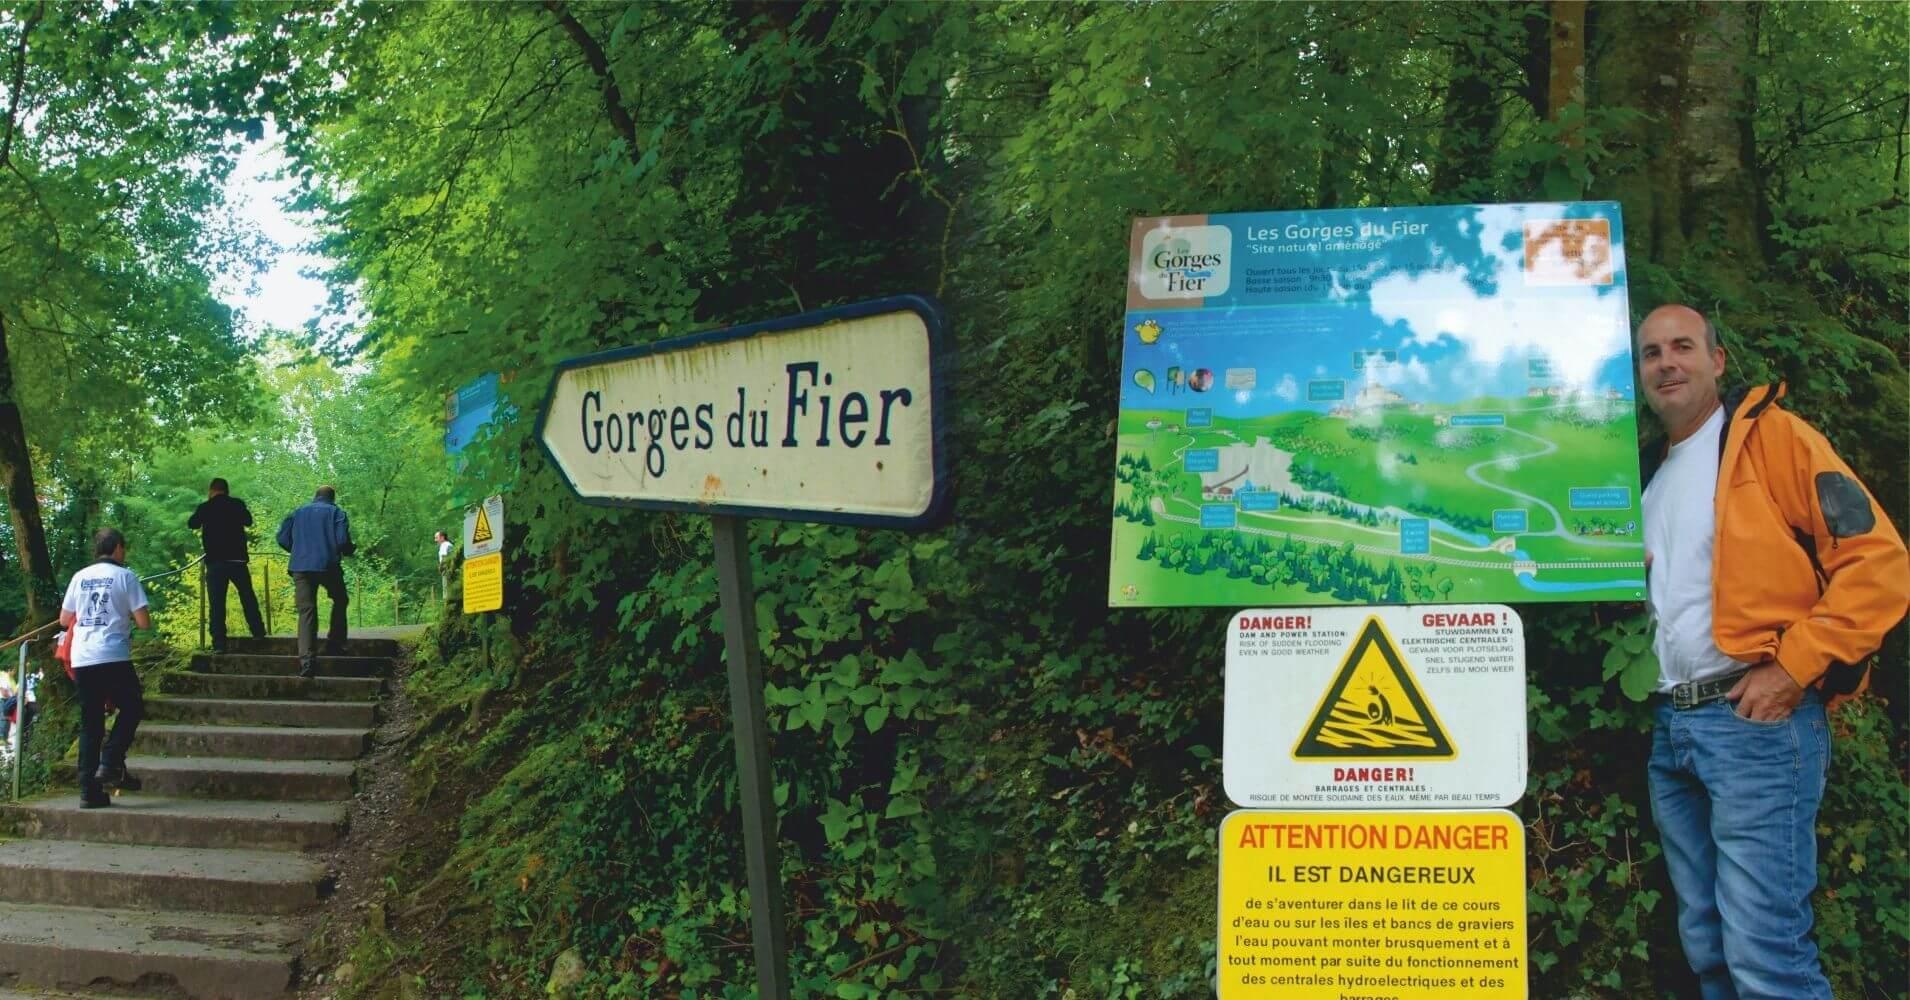 Gorges du Fier. Lovagni, Auvernia-Ródano-Alpes. Alta Saboya, Francia.